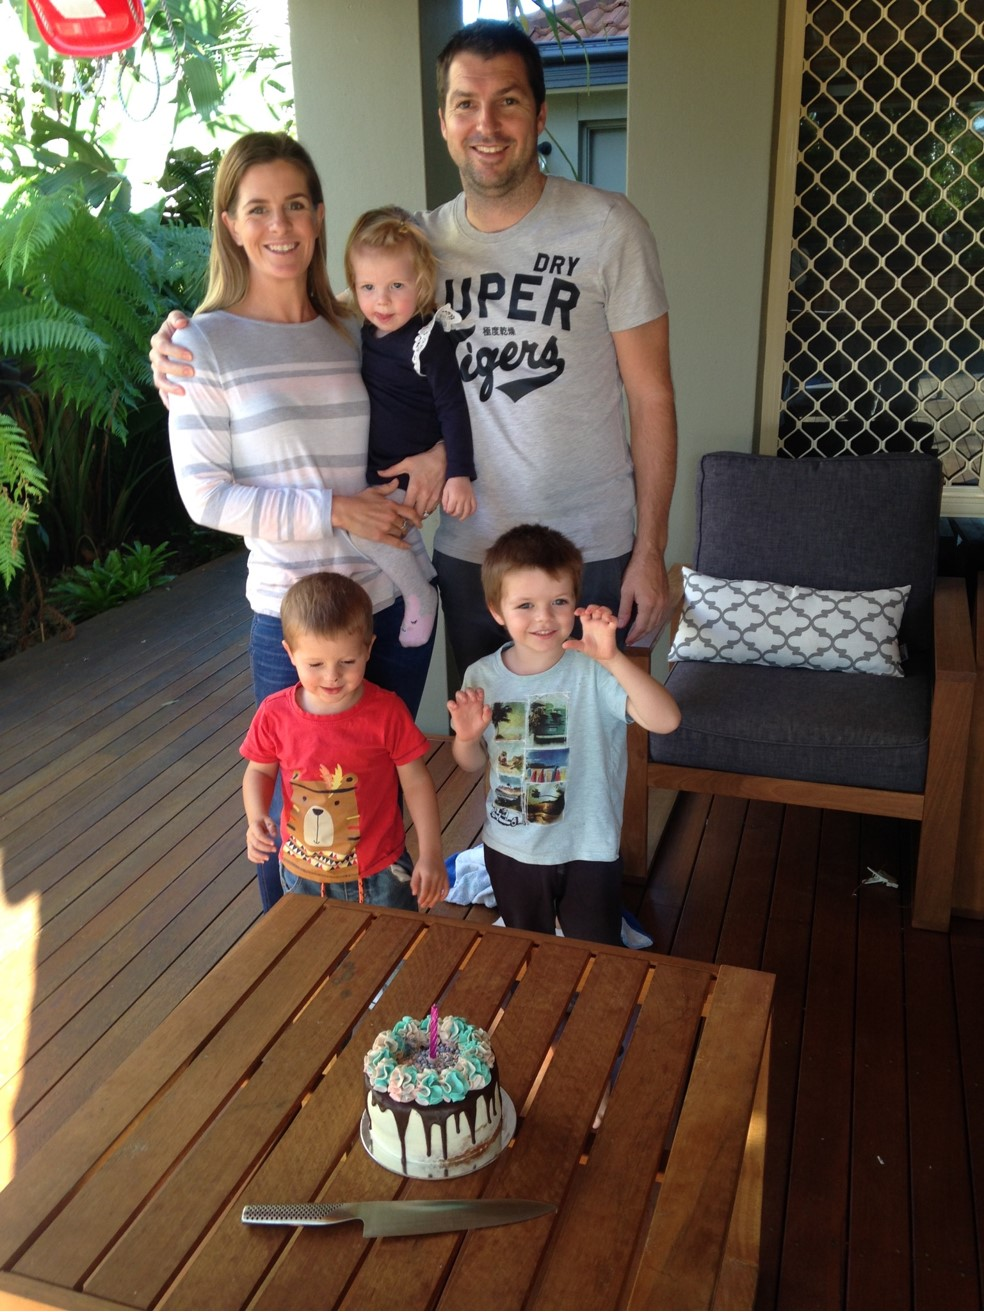 Stpoehanie family